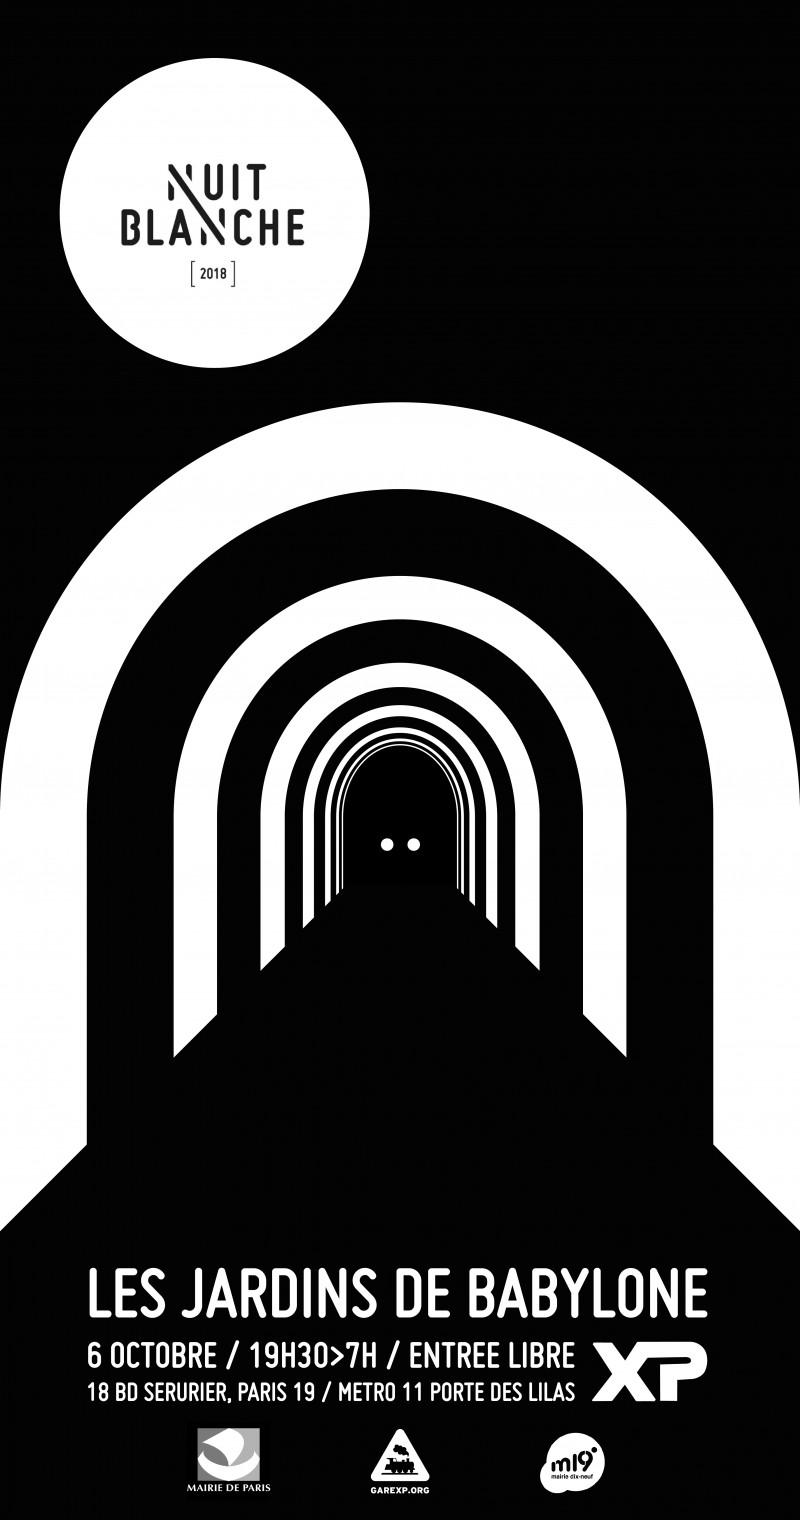 affiche-nuit-blanche-2018-gare-xp-bd3fe2a190fc98851bfbdb4ac6cff08d